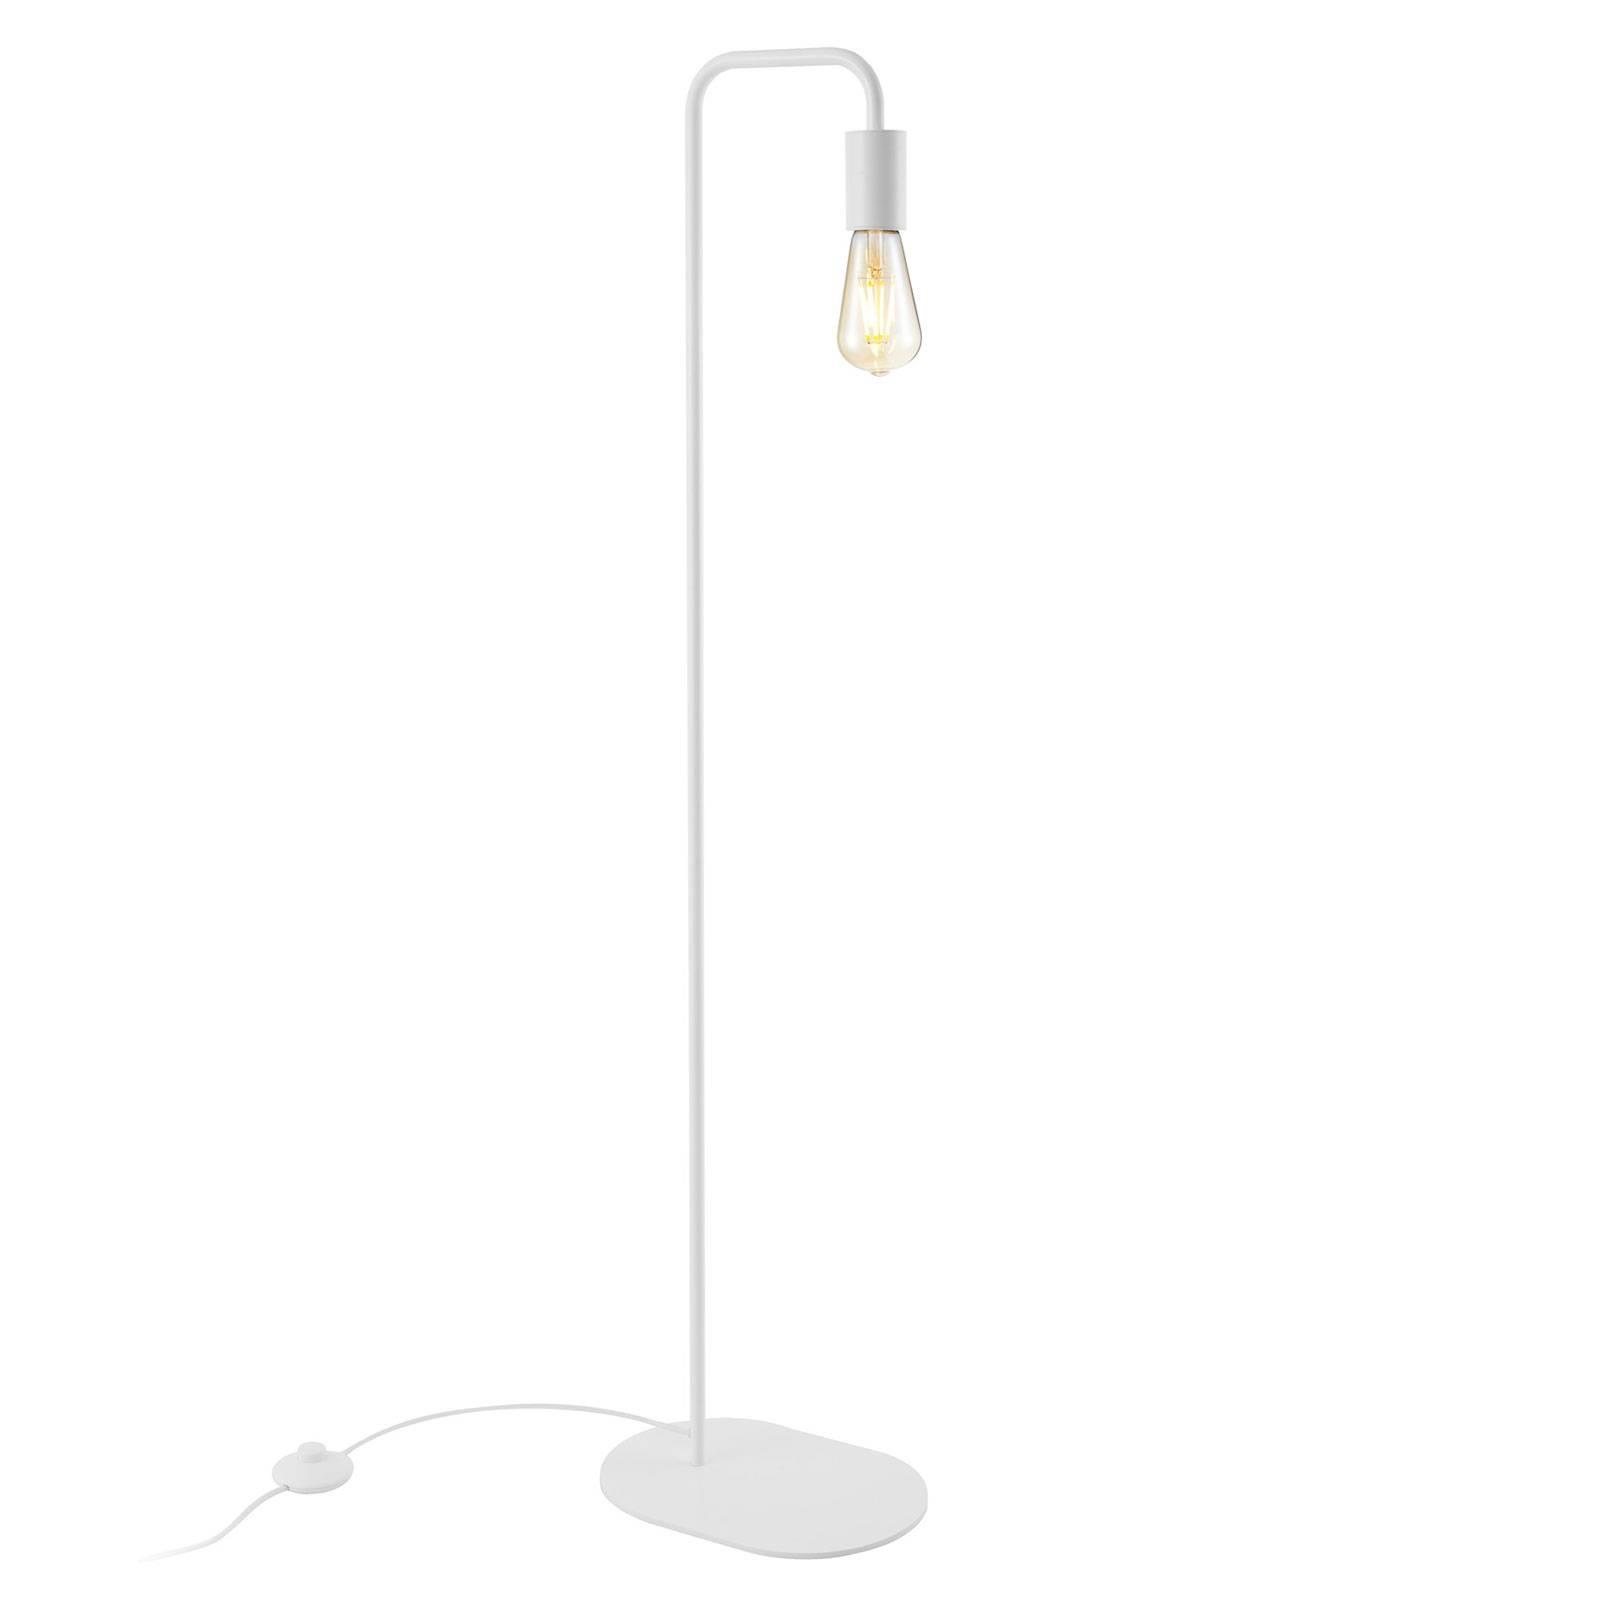 SLV Fitu lampadaire en métal, blanc